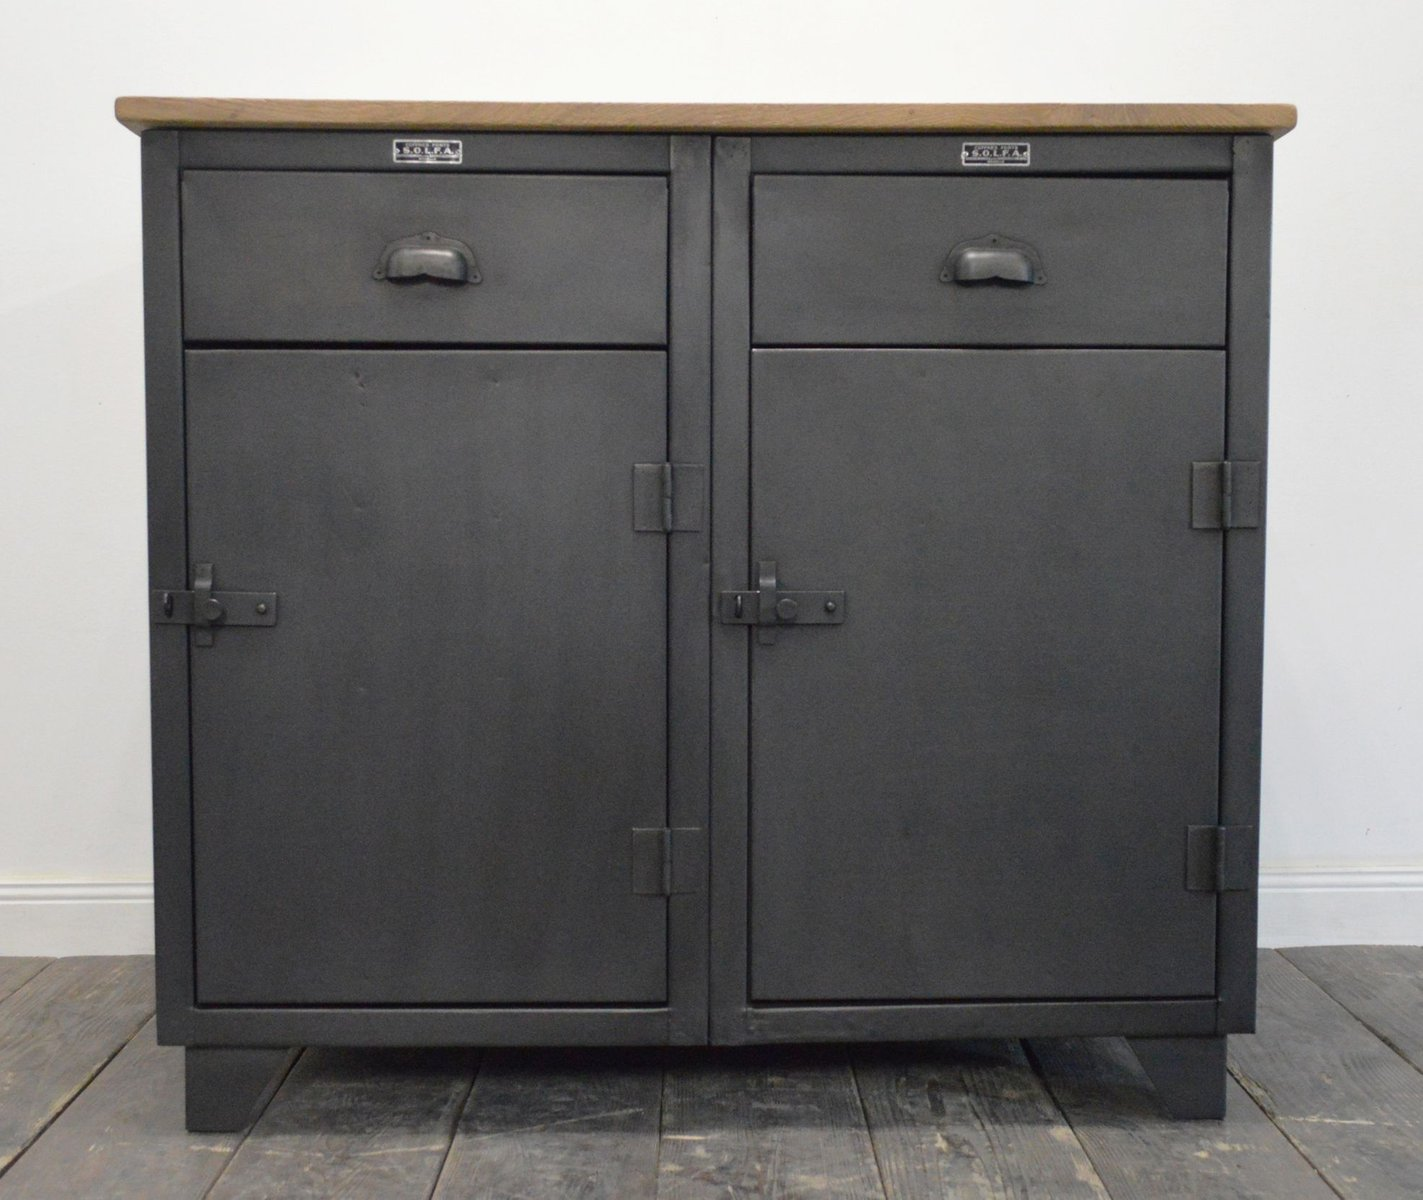 meuble vintage industriel de solfa en vente sur pamono. Black Bedroom Furniture Sets. Home Design Ideas